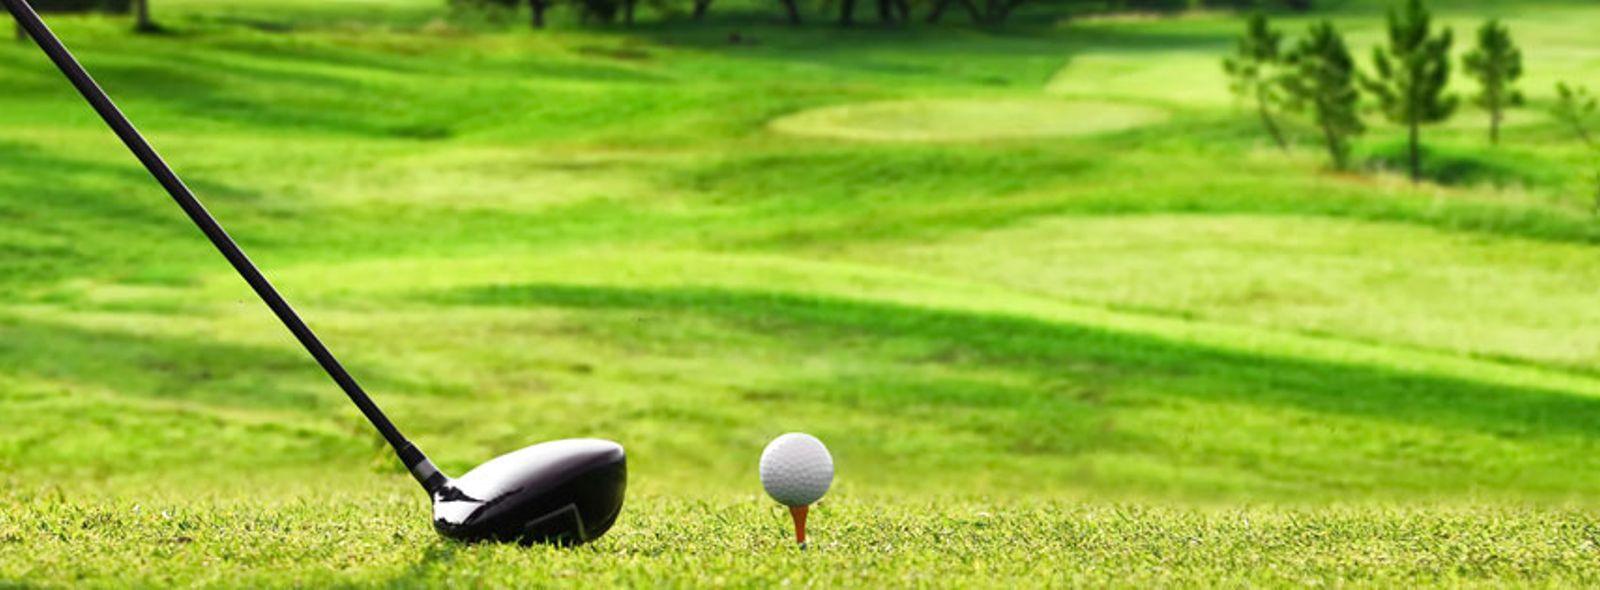 I migliori campi da golf in Italia